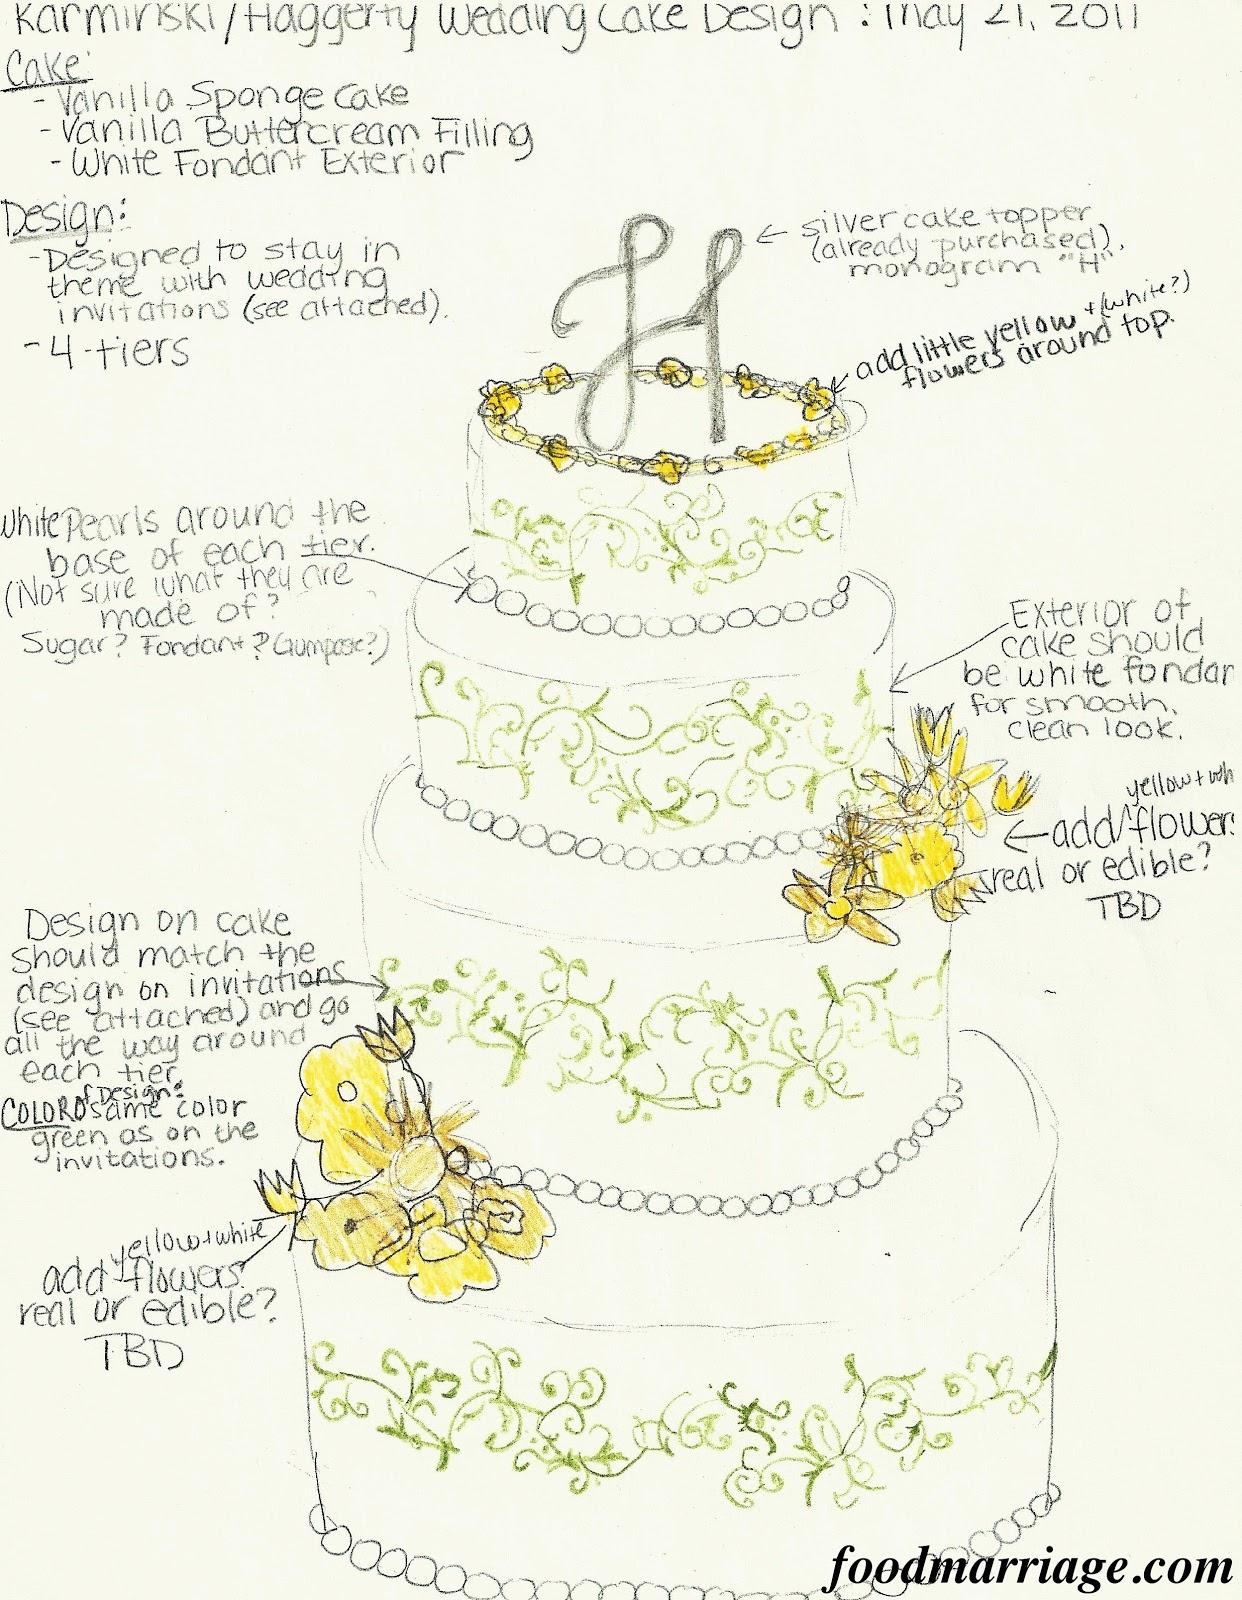 Wedding Cake Design Idea Food Marriage